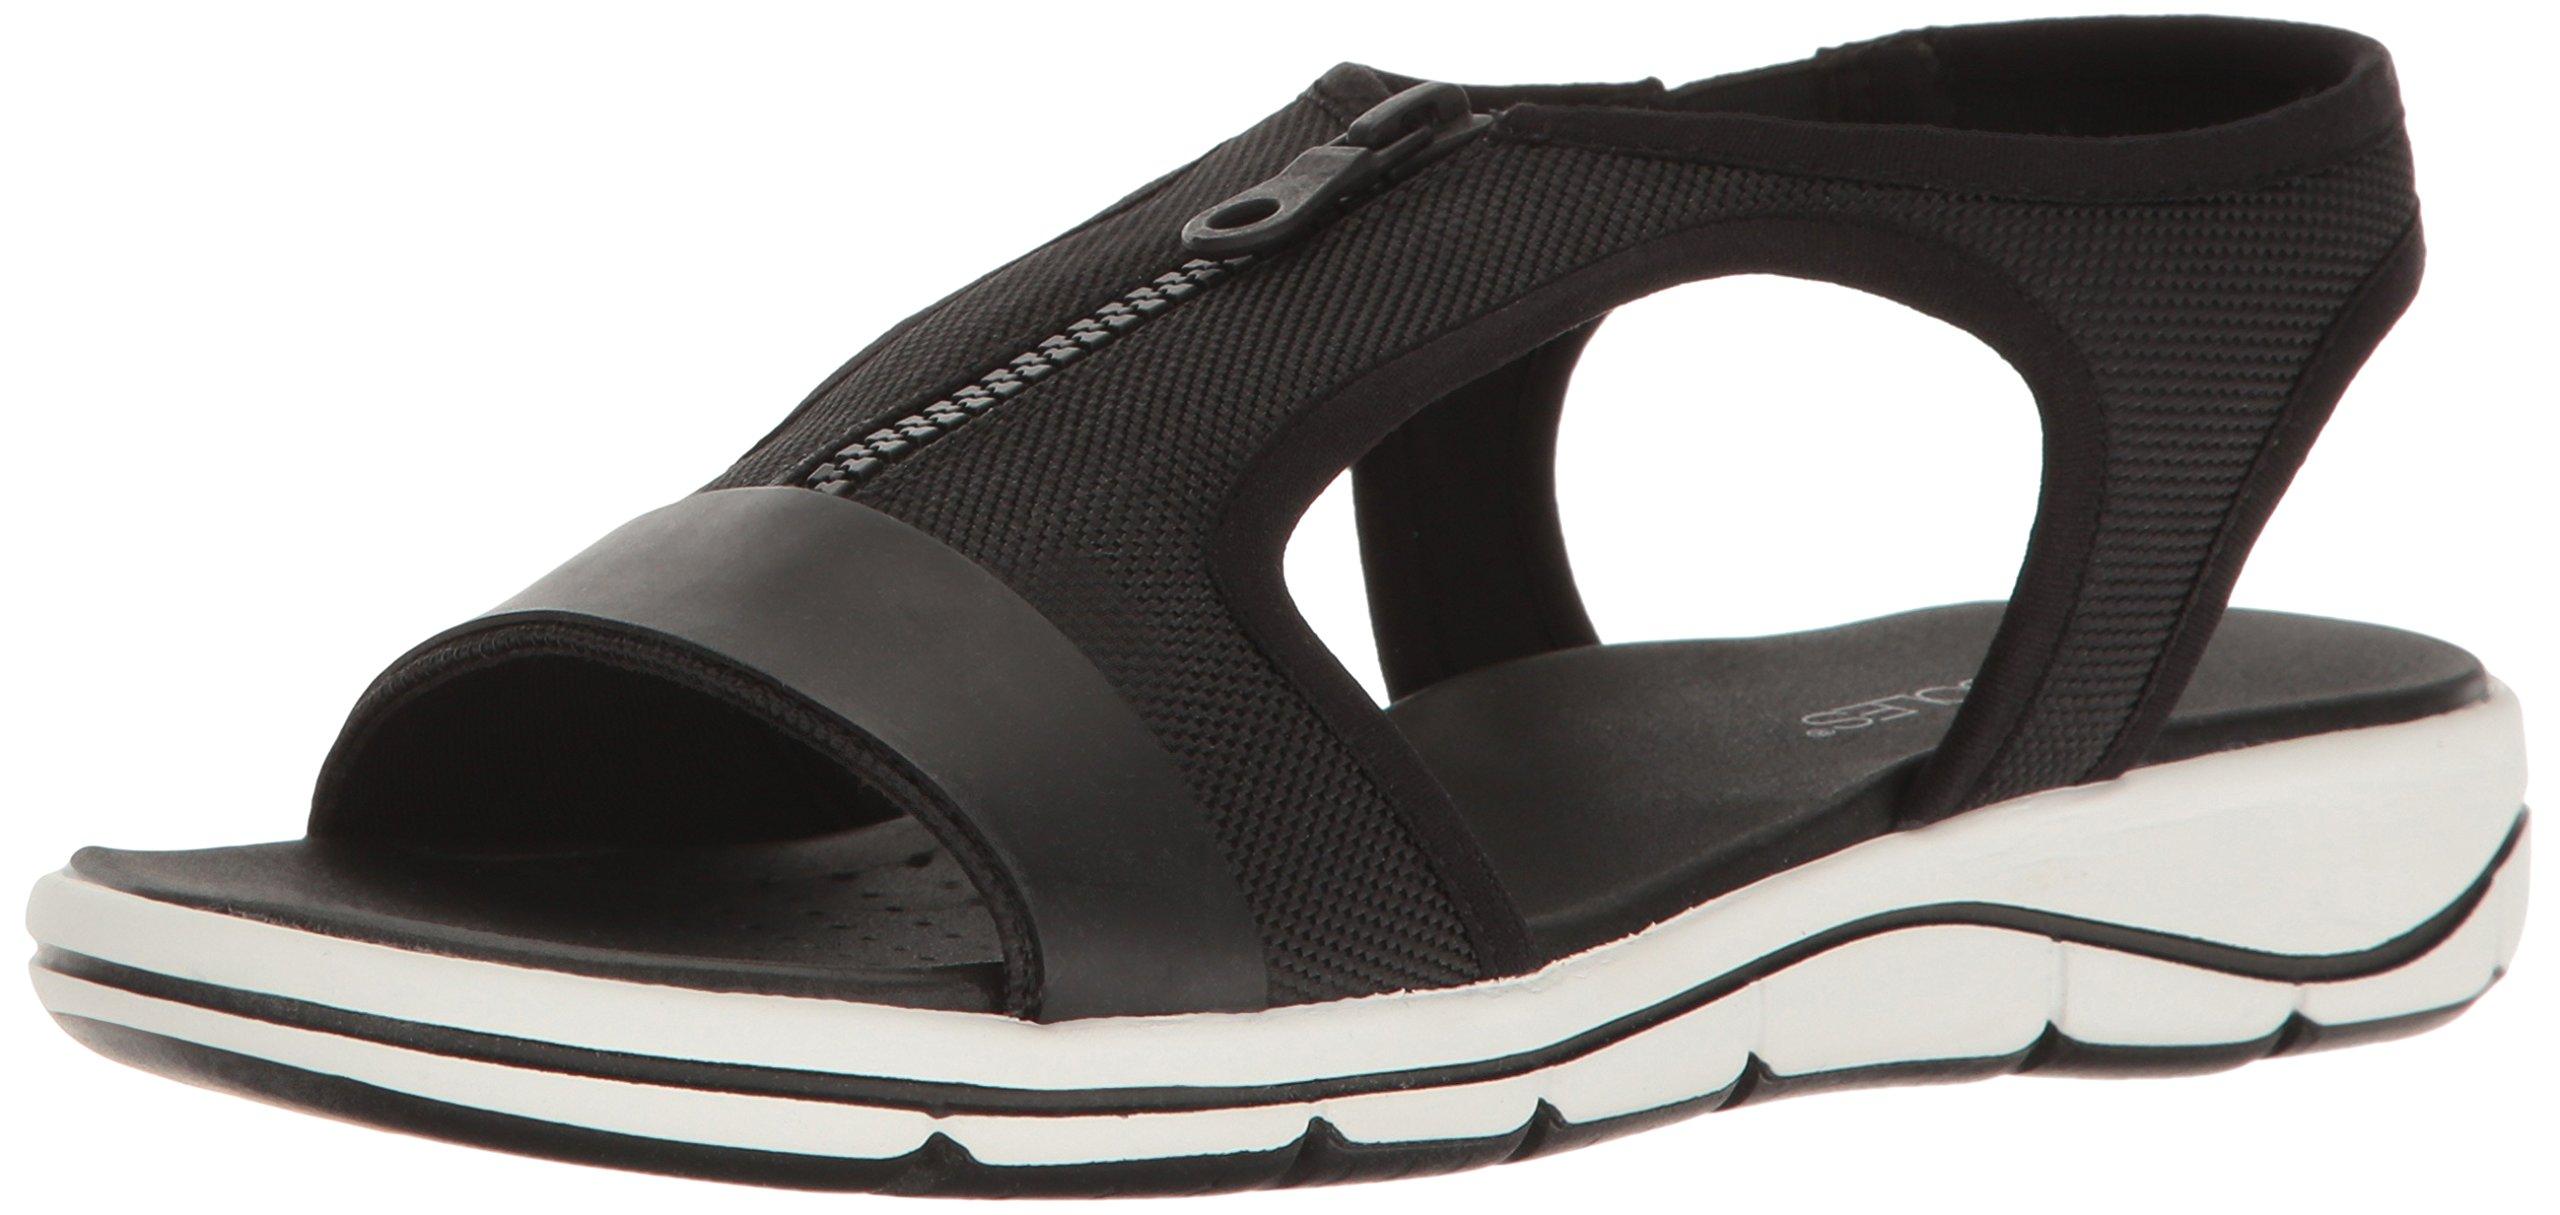 Aerosoles Women's Top Form Flat Sandal, Black Fabric, 5 M US